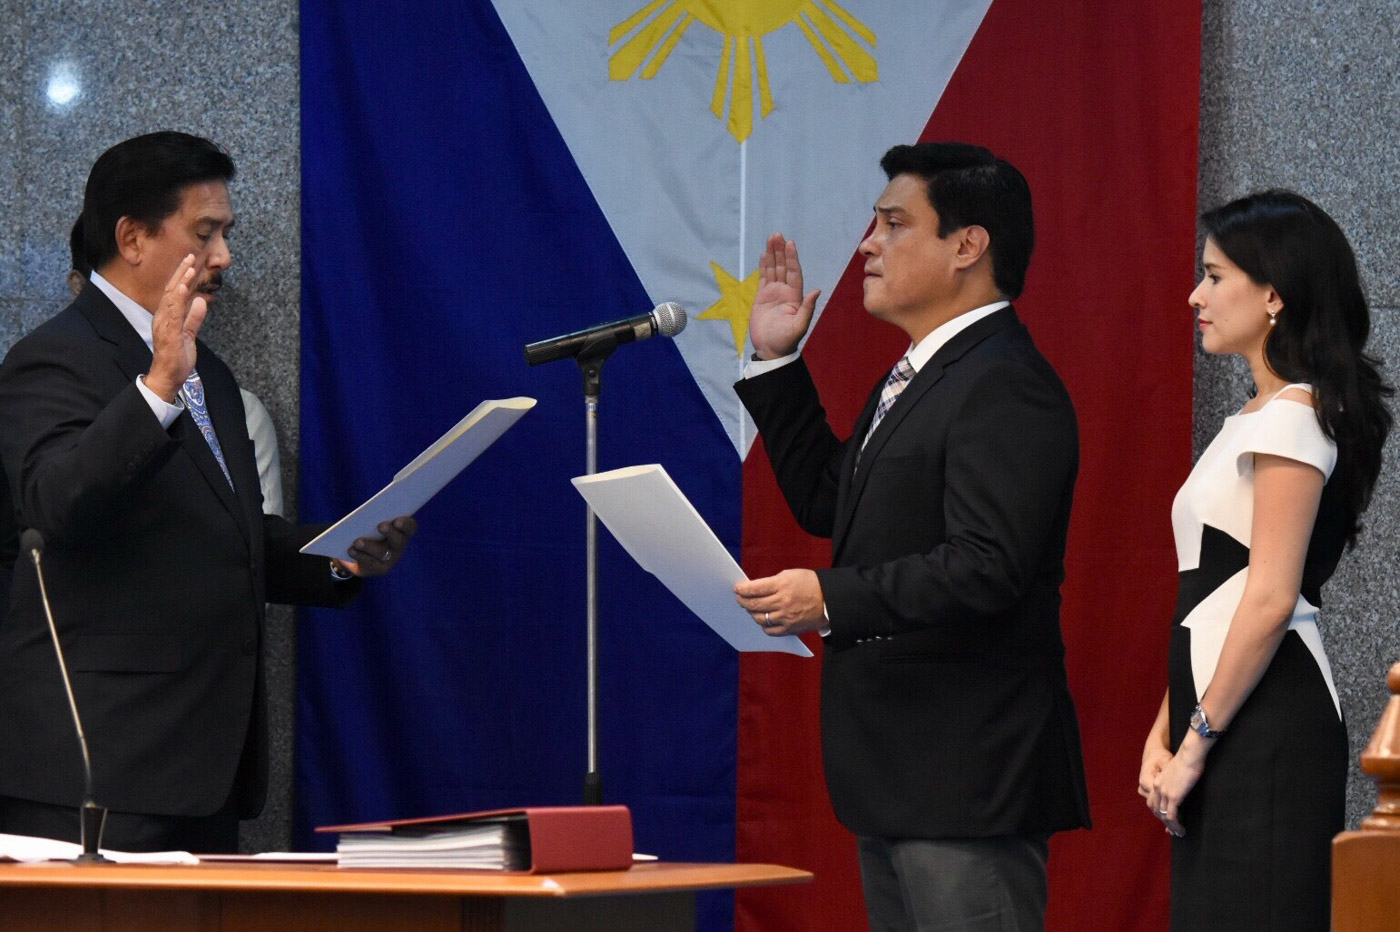 SOTTO'S SUCCESSOR. Senator Juan Miguel Zubiri is sworn in as Senate majority leader on May 21, 2018. Photo by Angie de Silva/Rappler